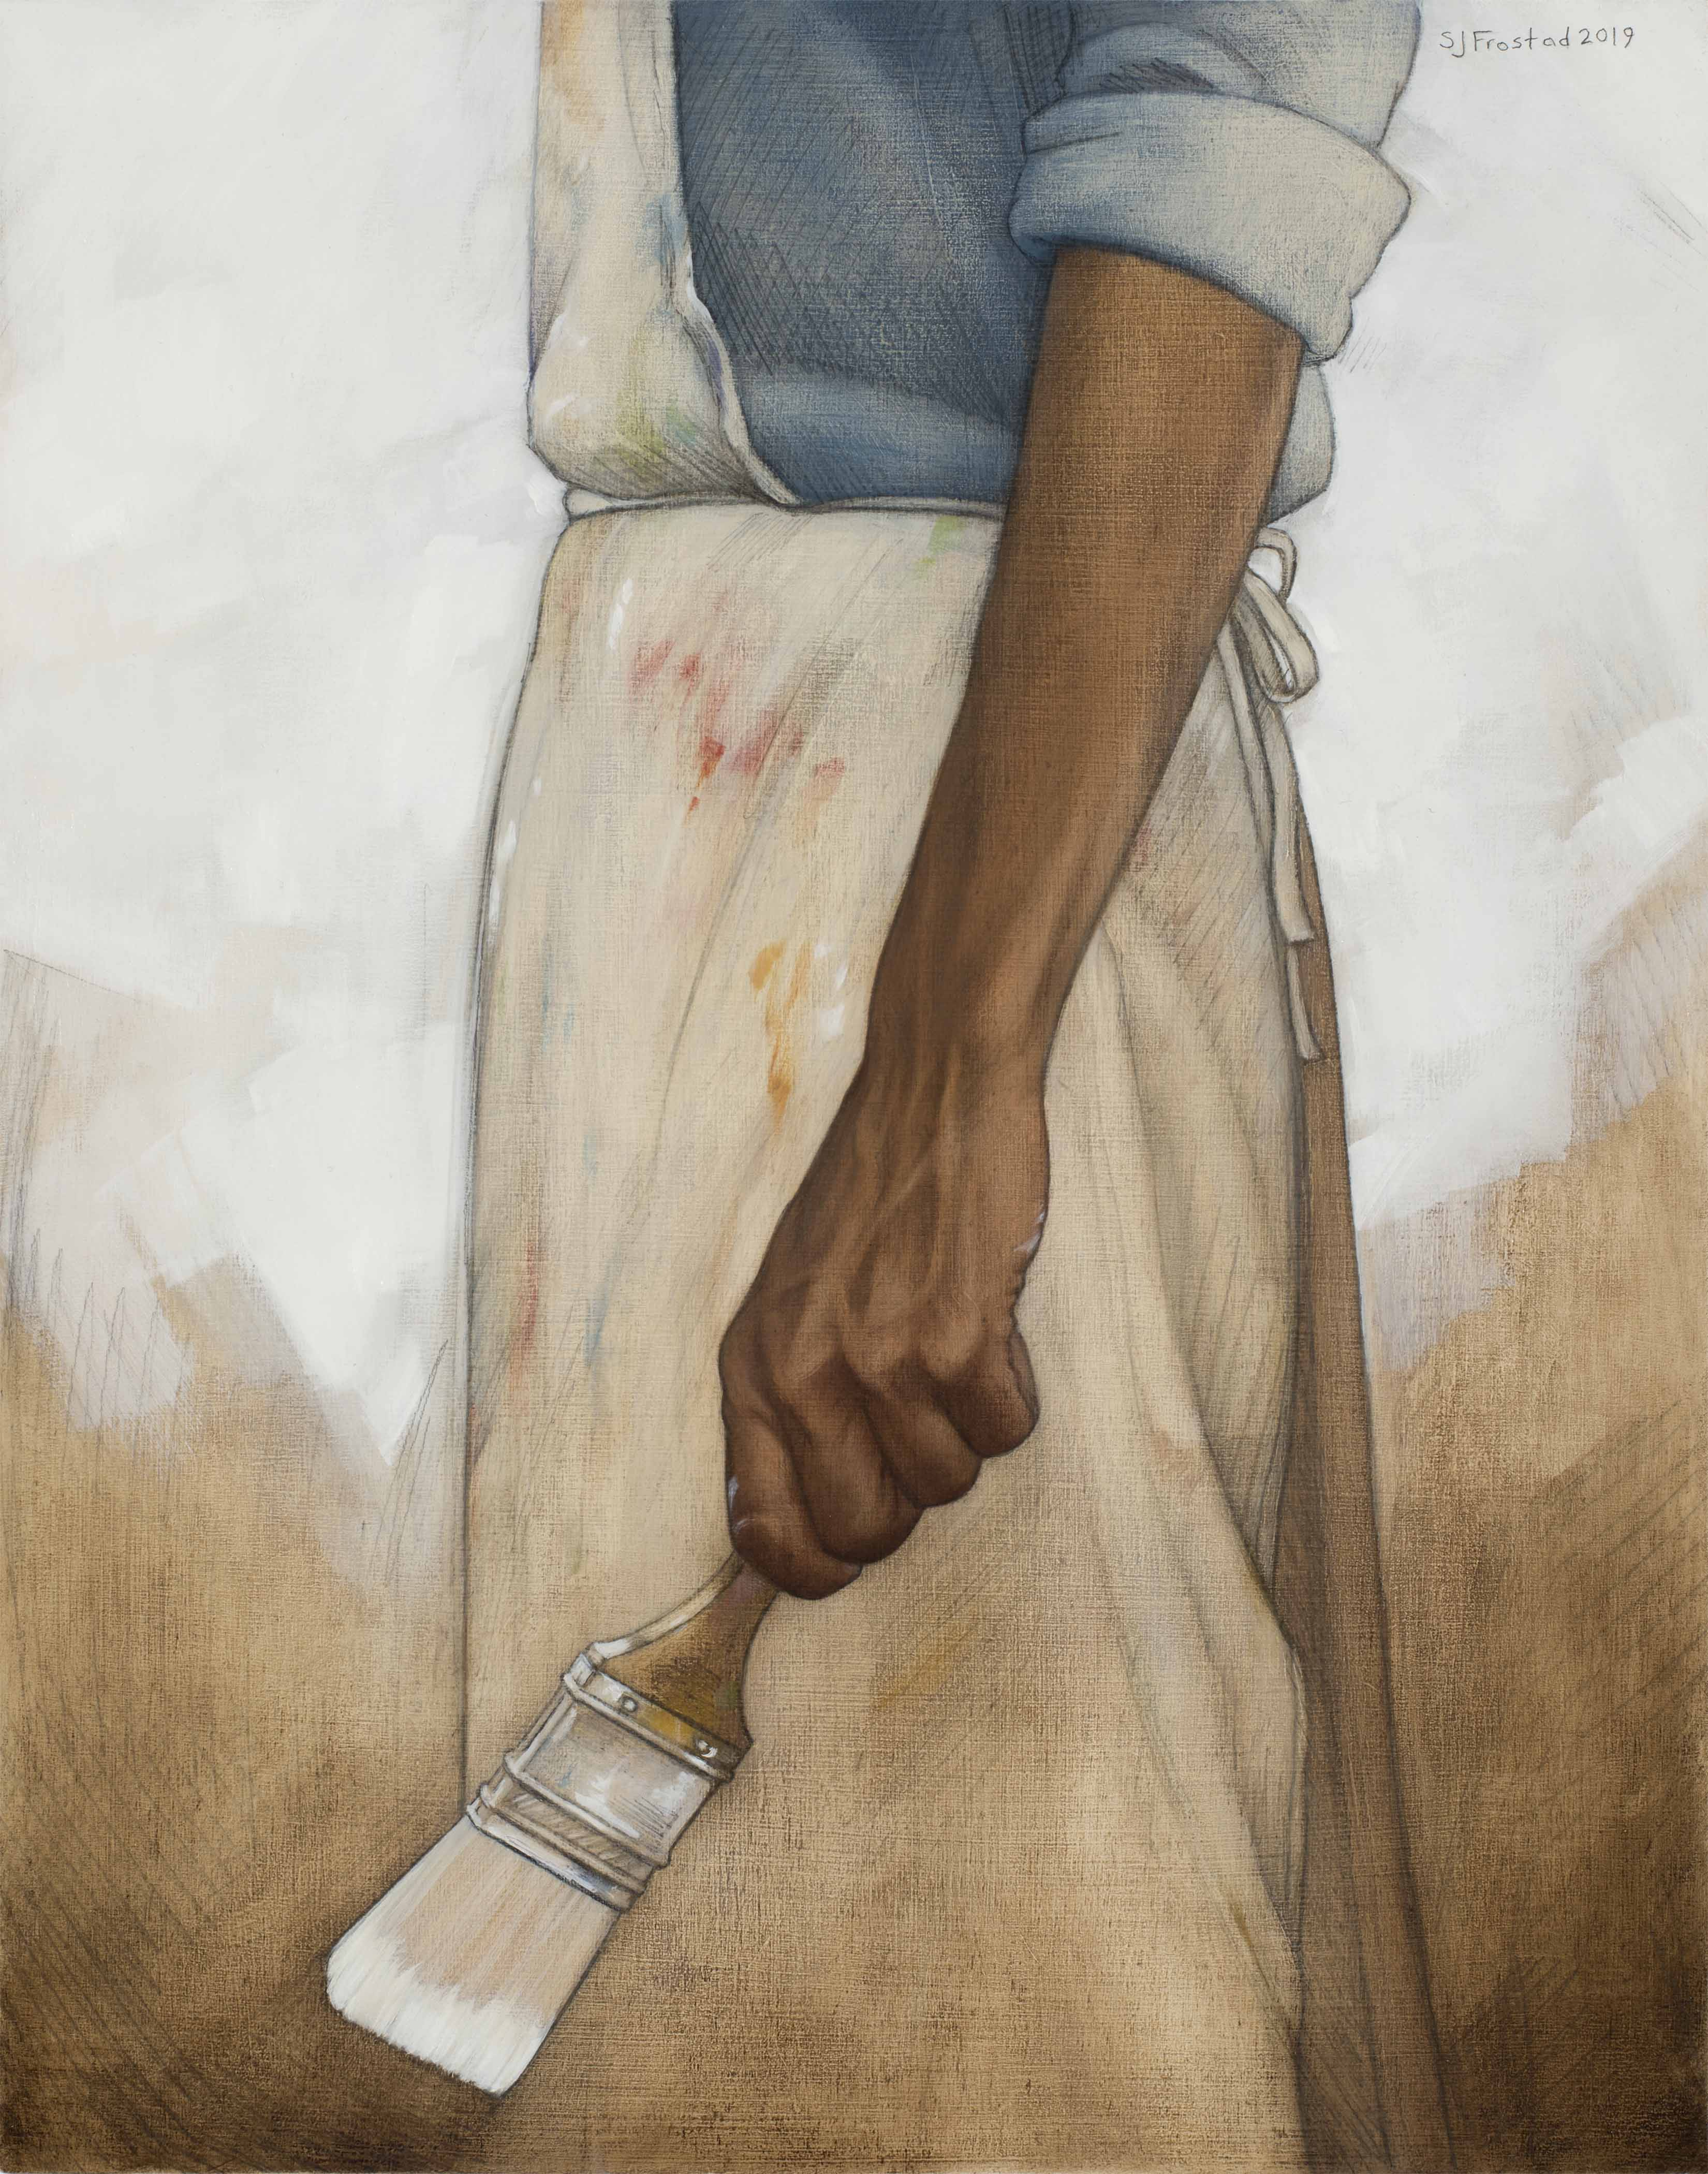 "Tabula Rasa, 2019. Graphite & oil on wood panel, 14x11"". Sold"